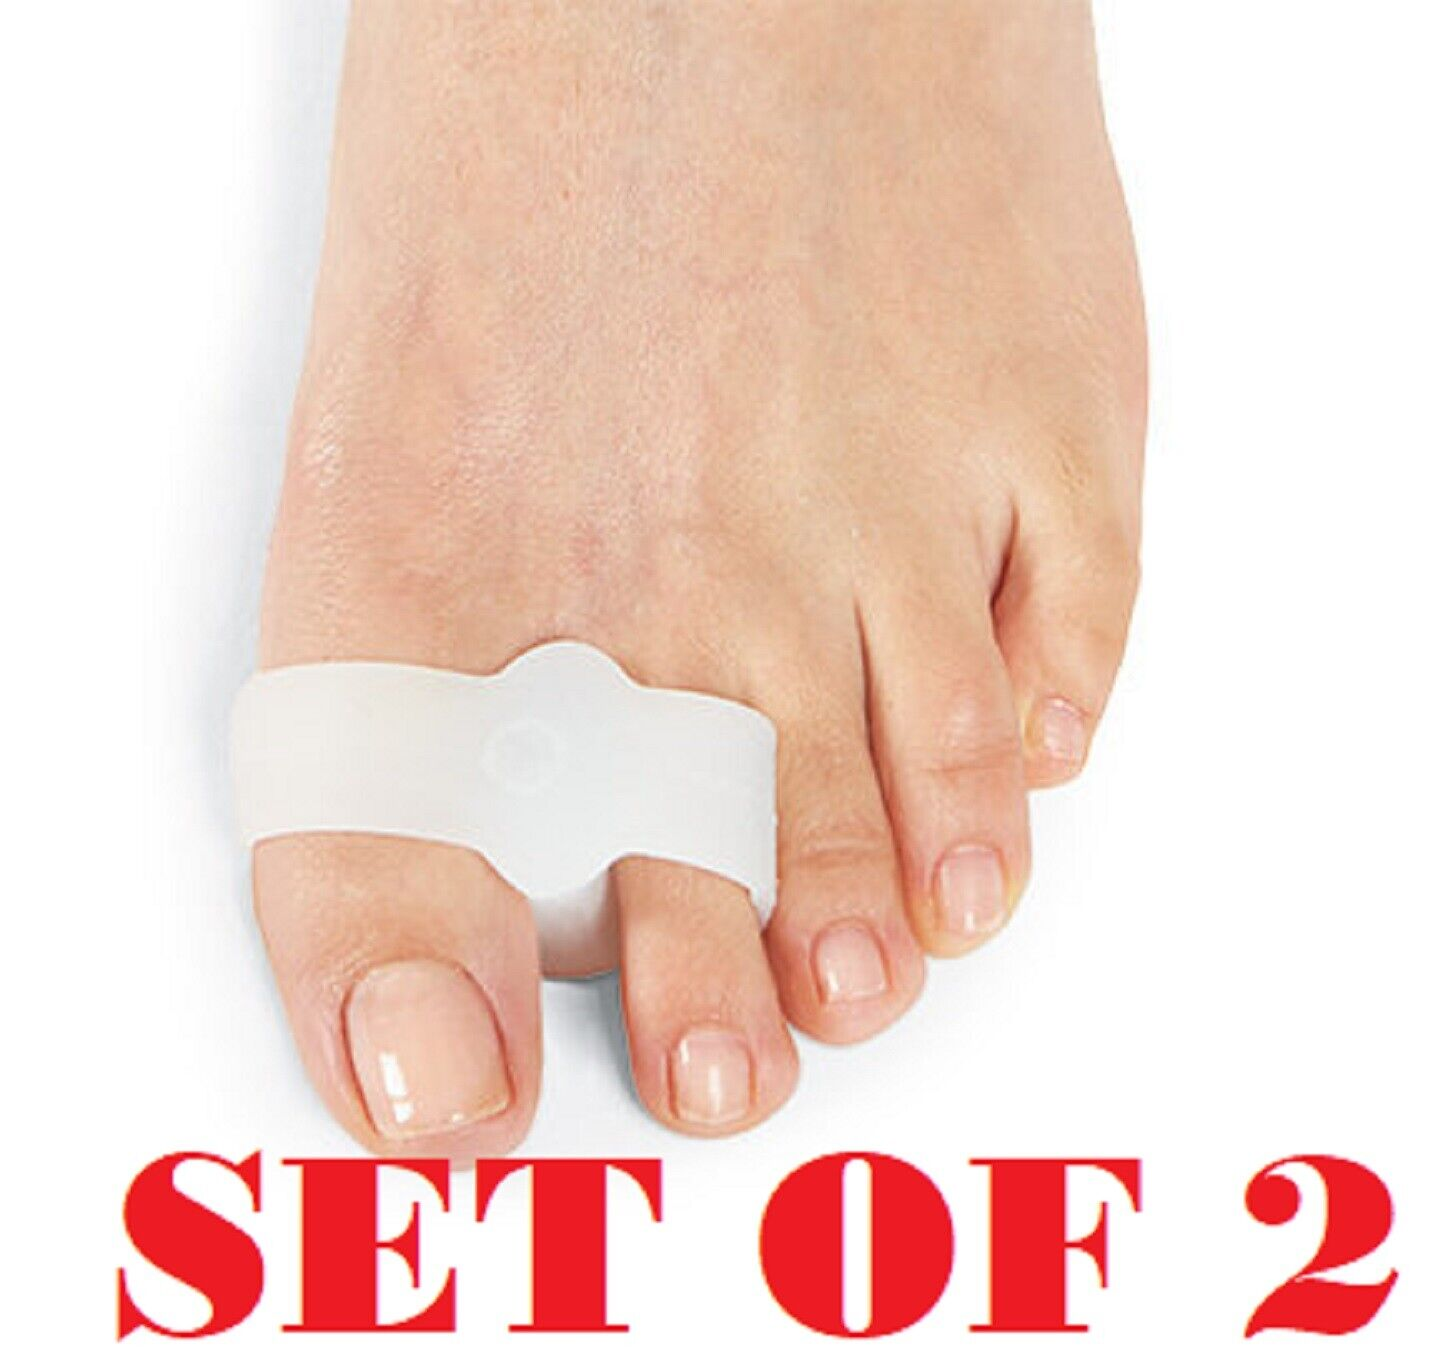 Visco Gel ToeBuddy Toe Spacer 2 Loops Separates Aligns Crooked Overlapping Toes Foot Creams & Treatments